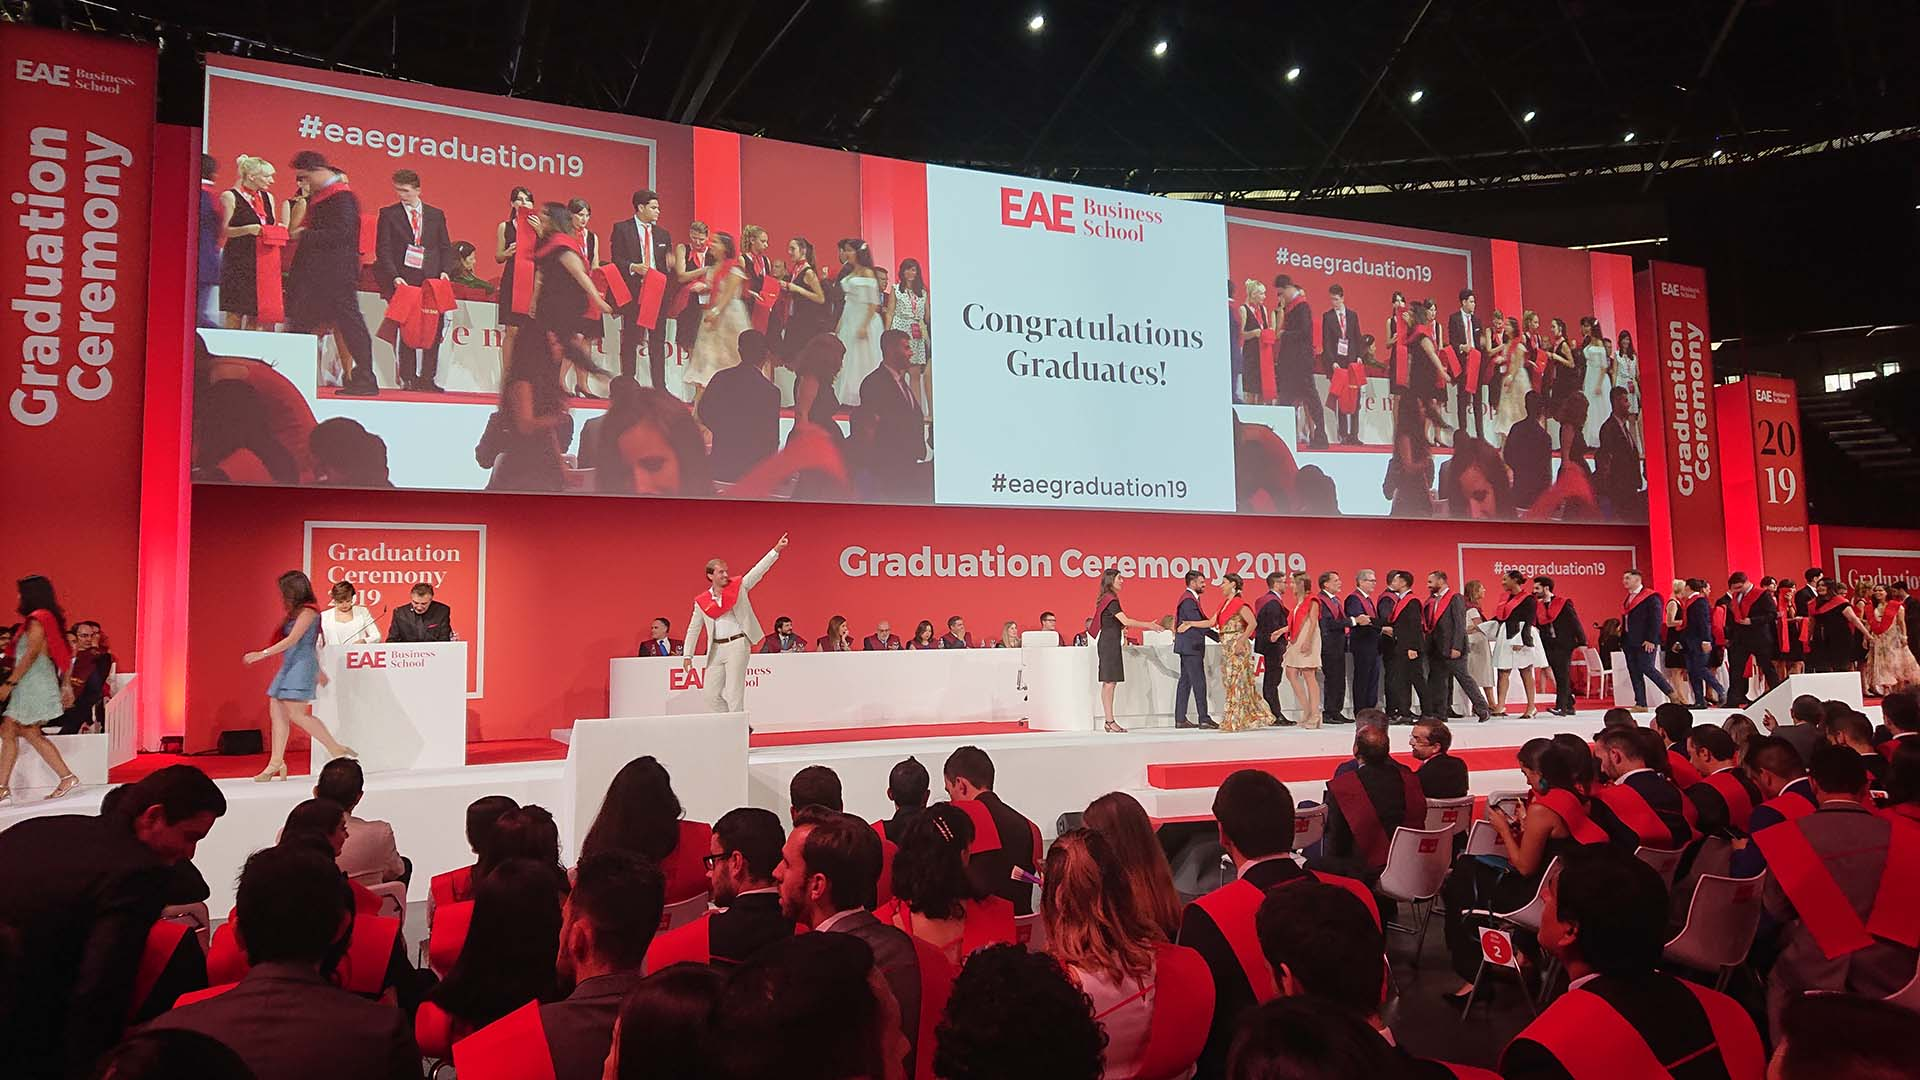 EAE graduation event scenography design